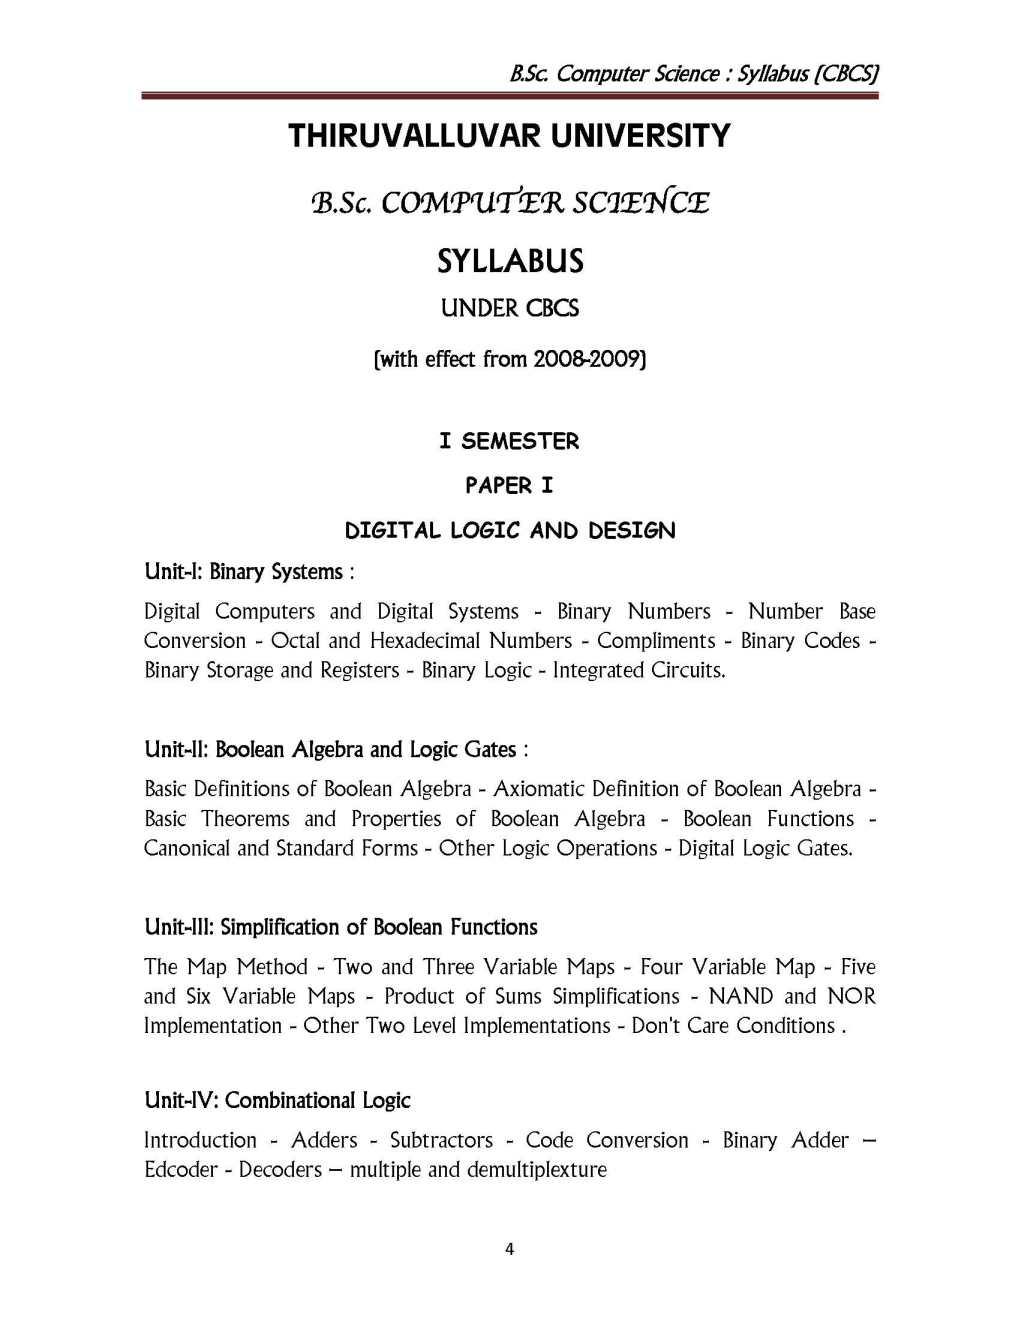 Top 12 Thiruvalluvar University Bsc Maths Syllabus 2018 Pdf